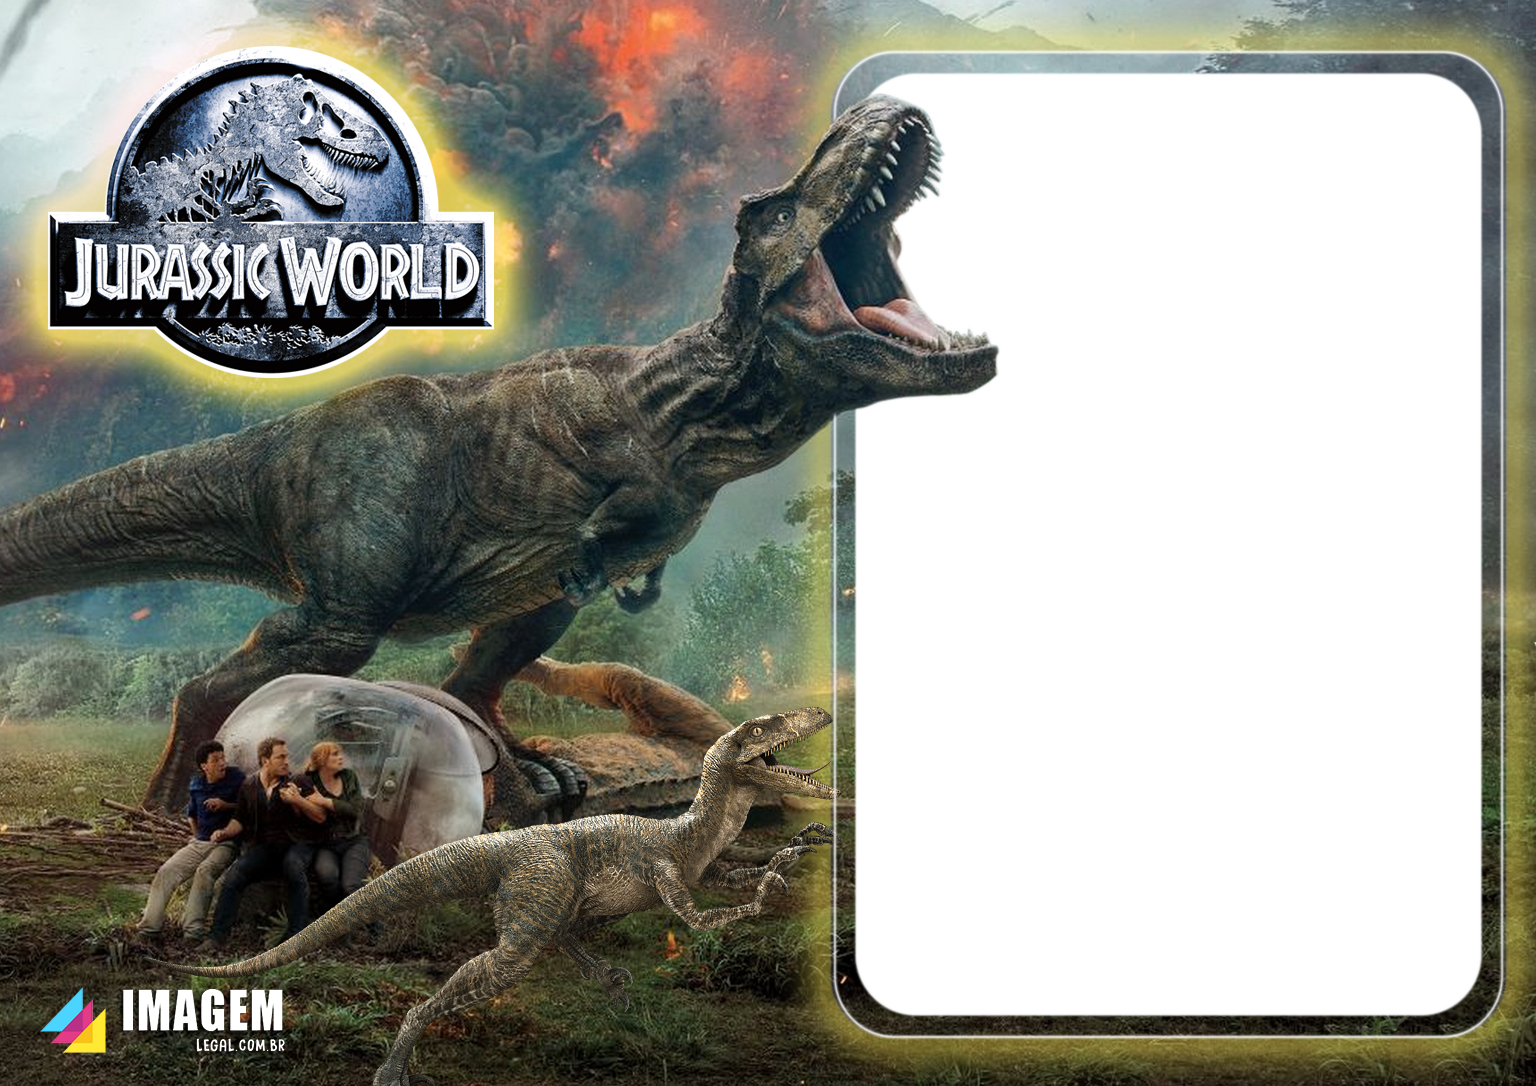 Jurassic World Moldura PNG